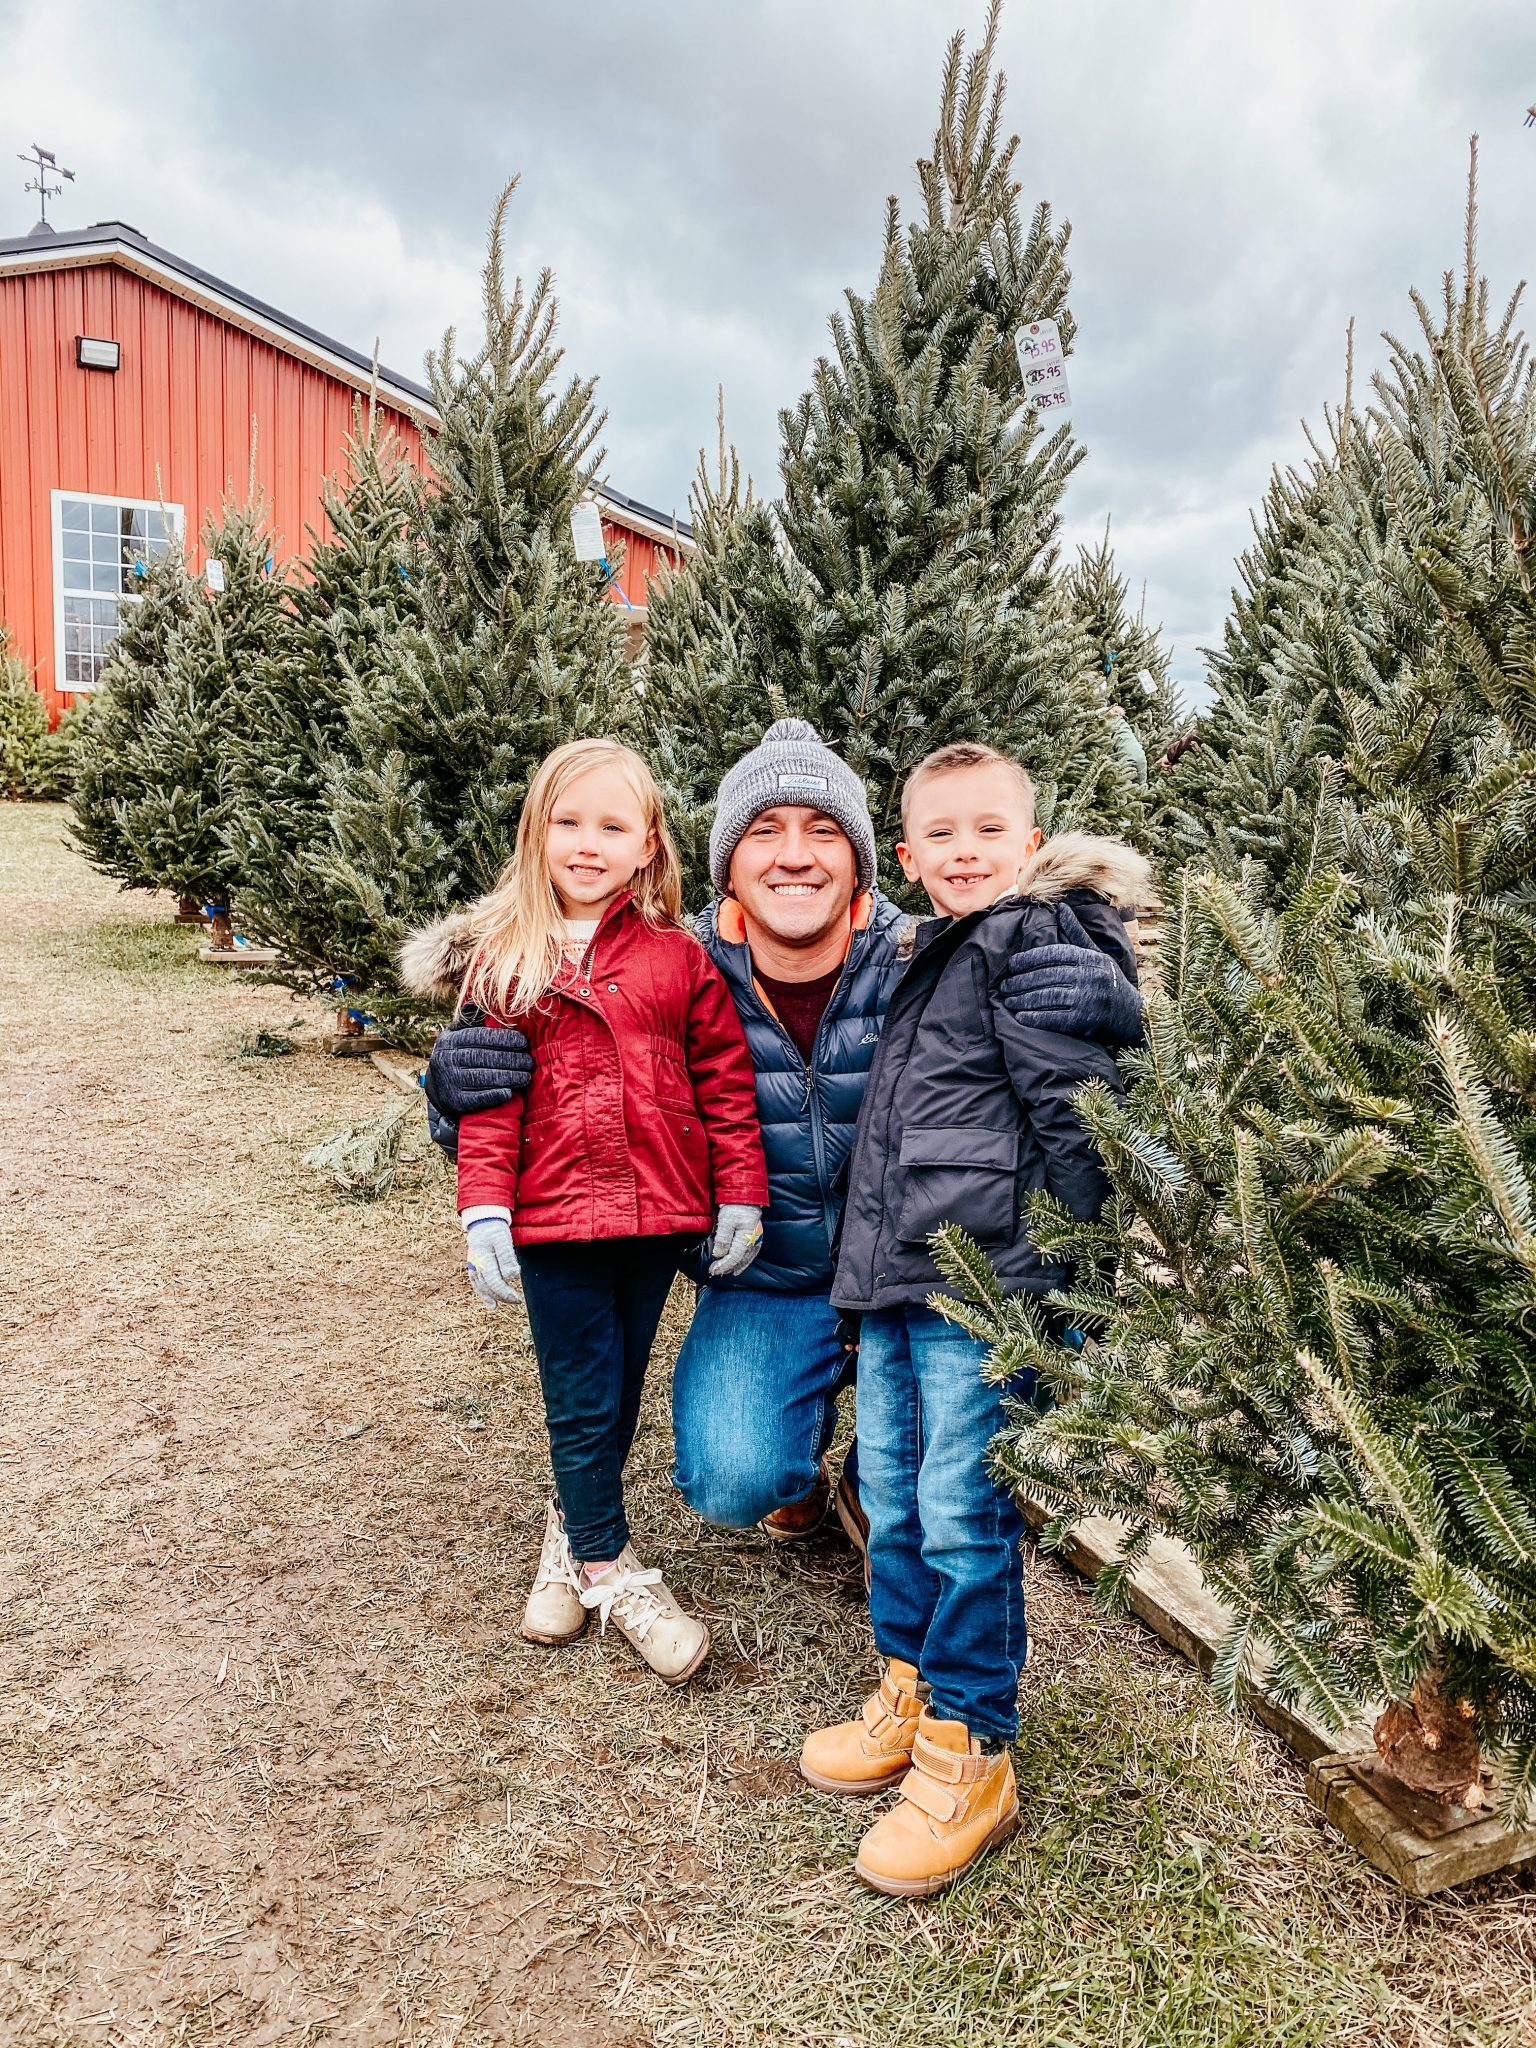 Winter outings with the family | Daily Splendor Life and Style Blog | Christmas Tree Farm #familychristmas #holidayfestivities #familyadventures #Christmastree #momlife